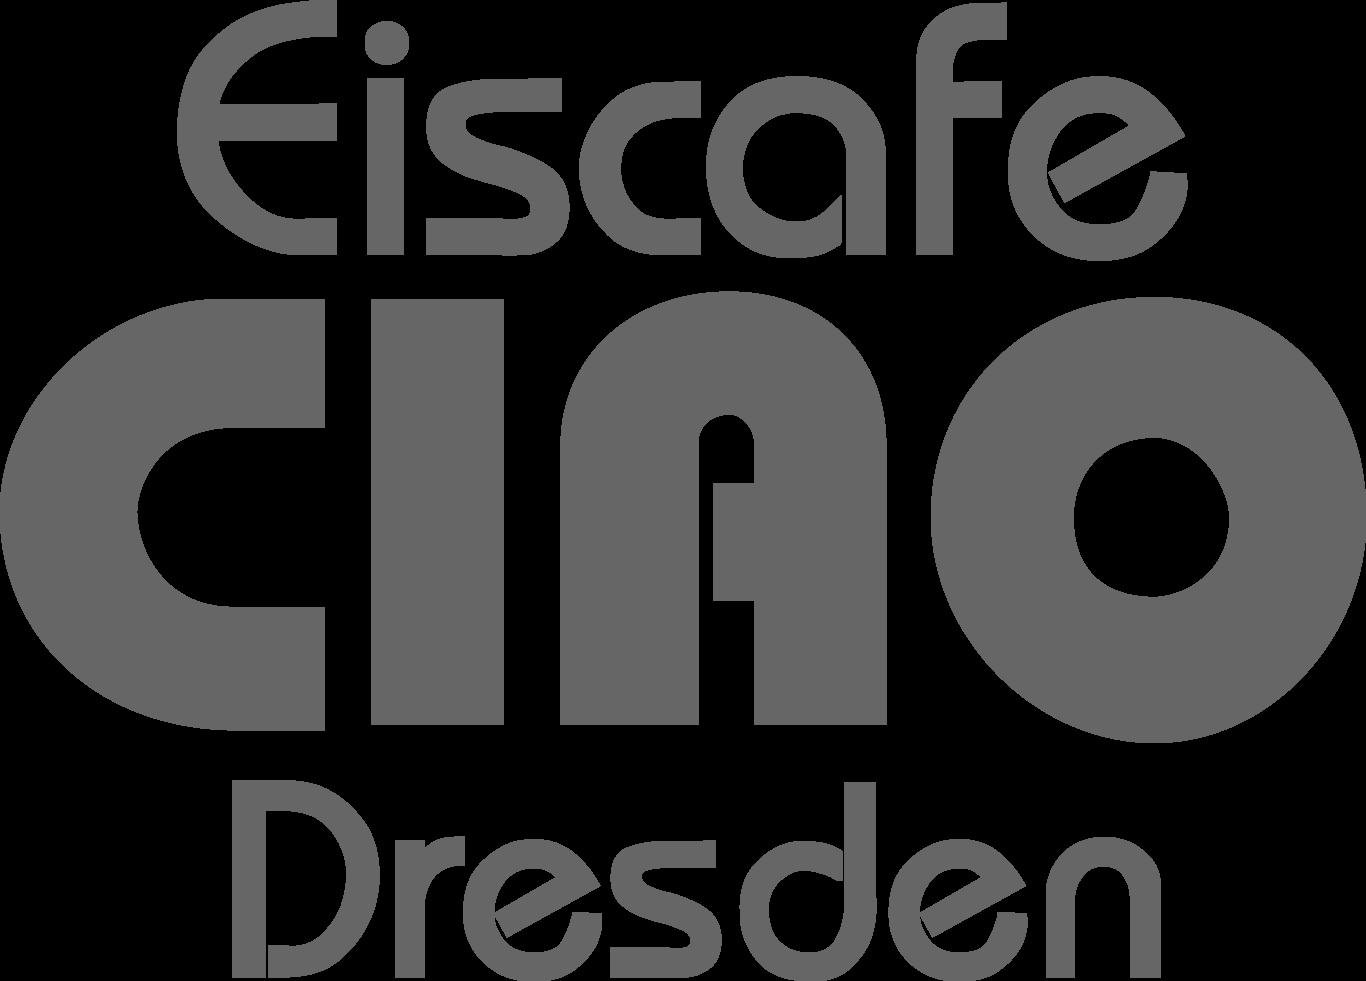 Eiscafe CIAO Dresden